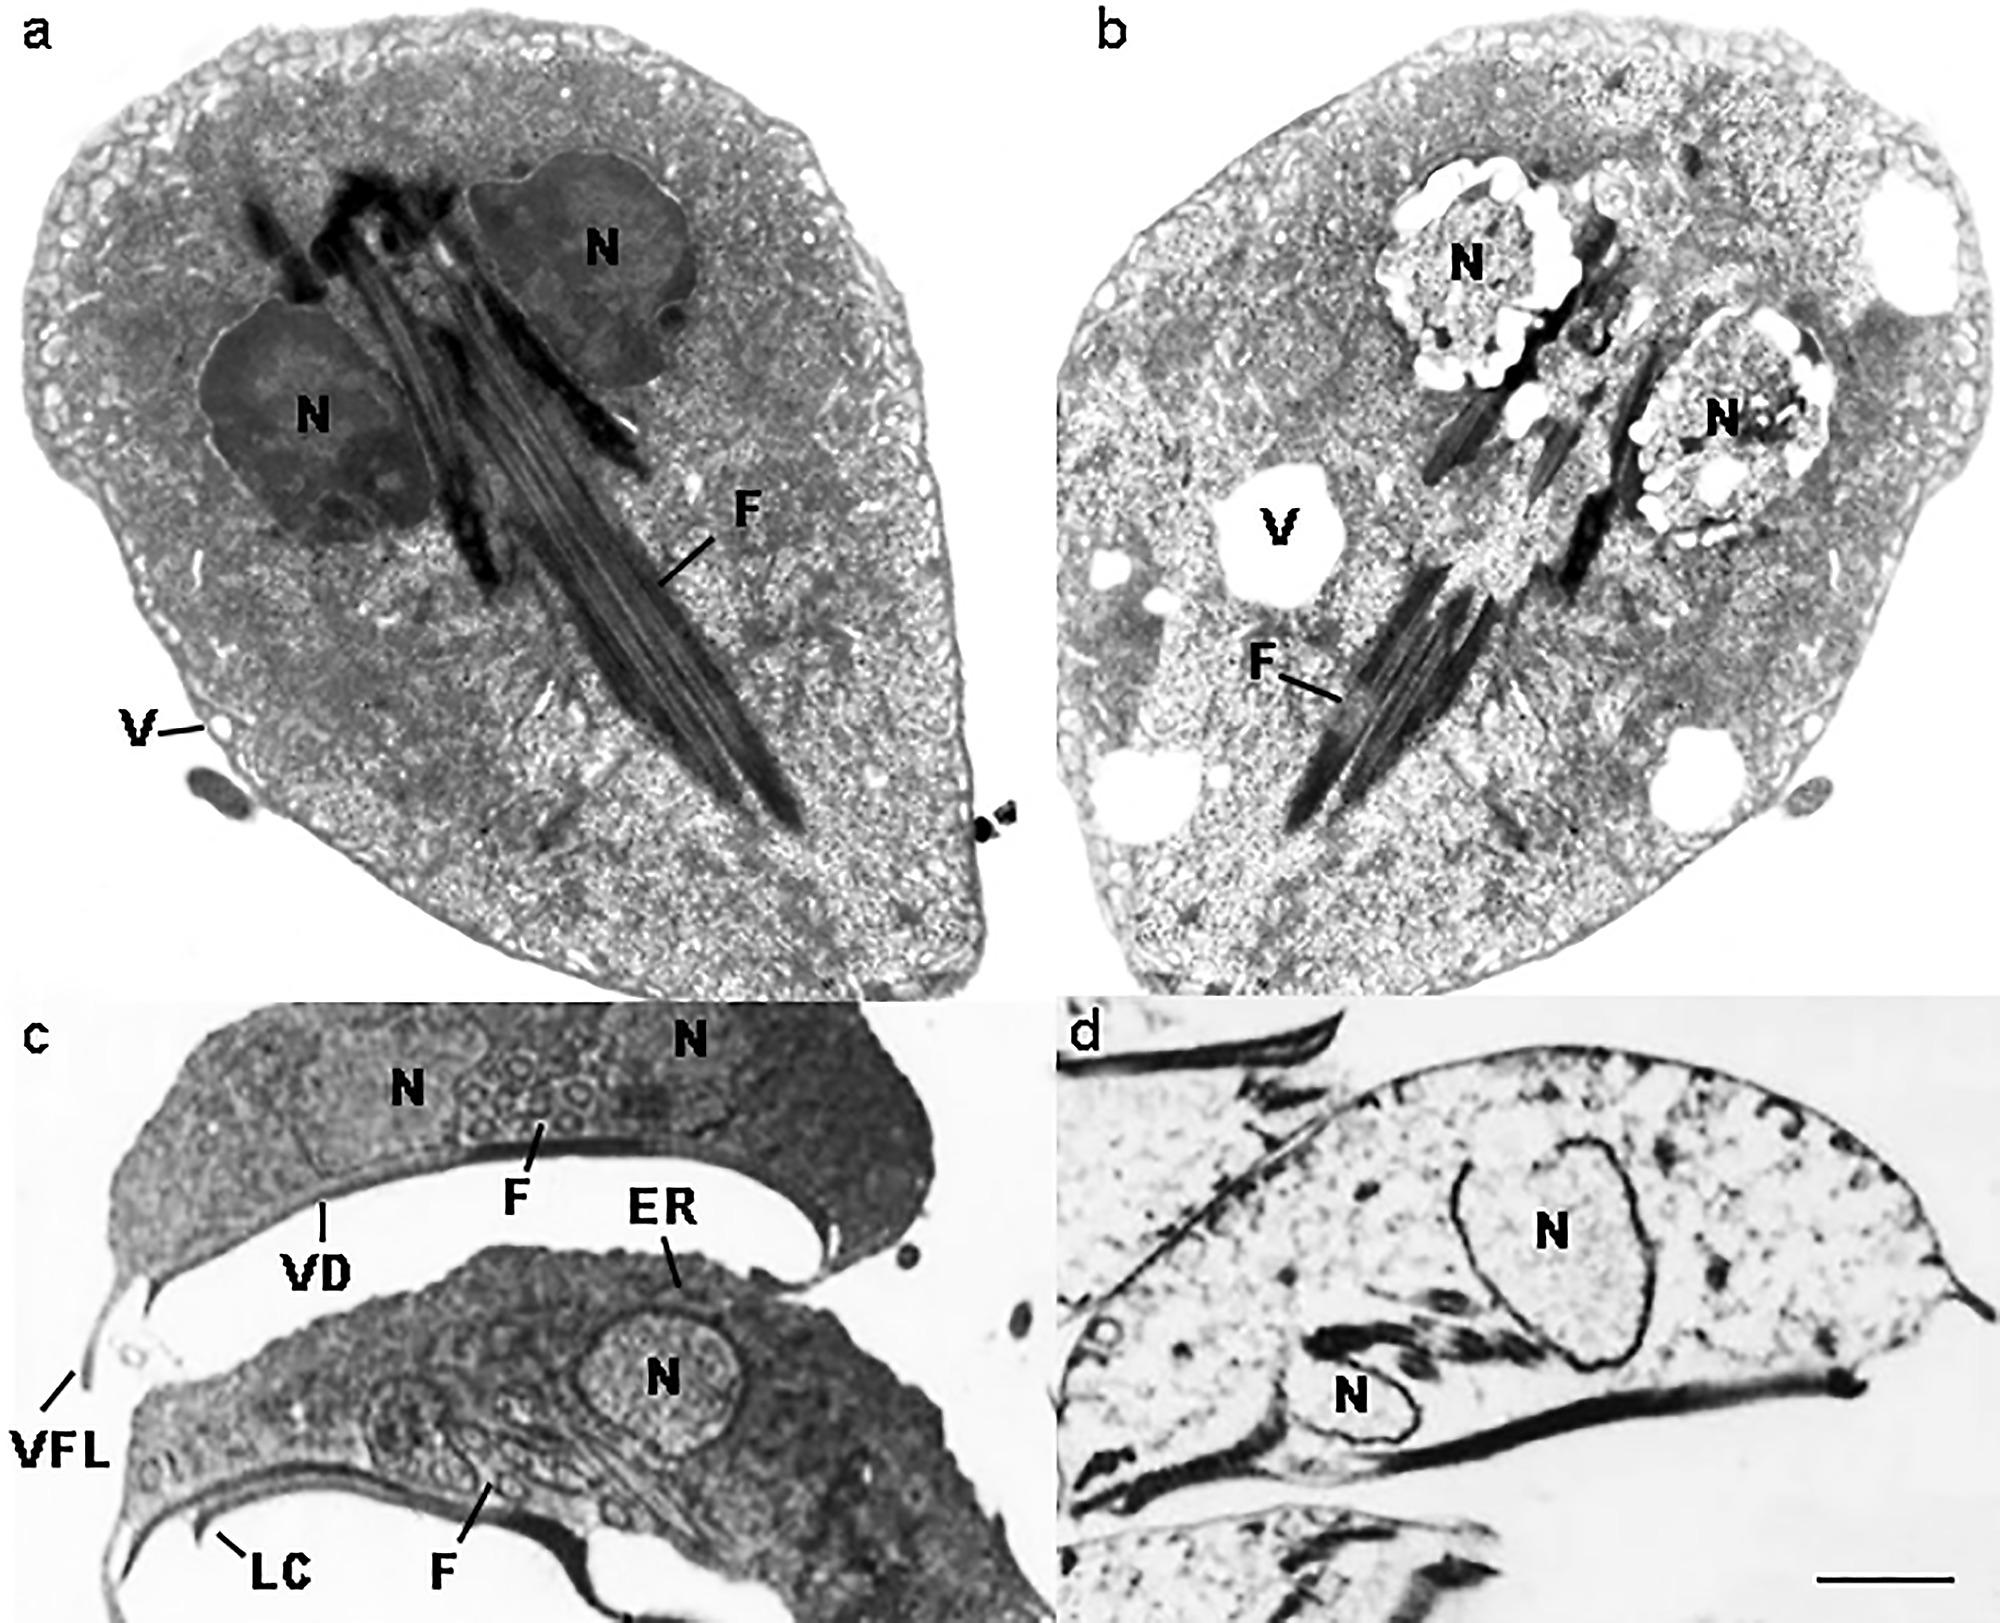 Untreated giardia in humans. Ogulov giardiasis ,Találtam férgeket a székletben